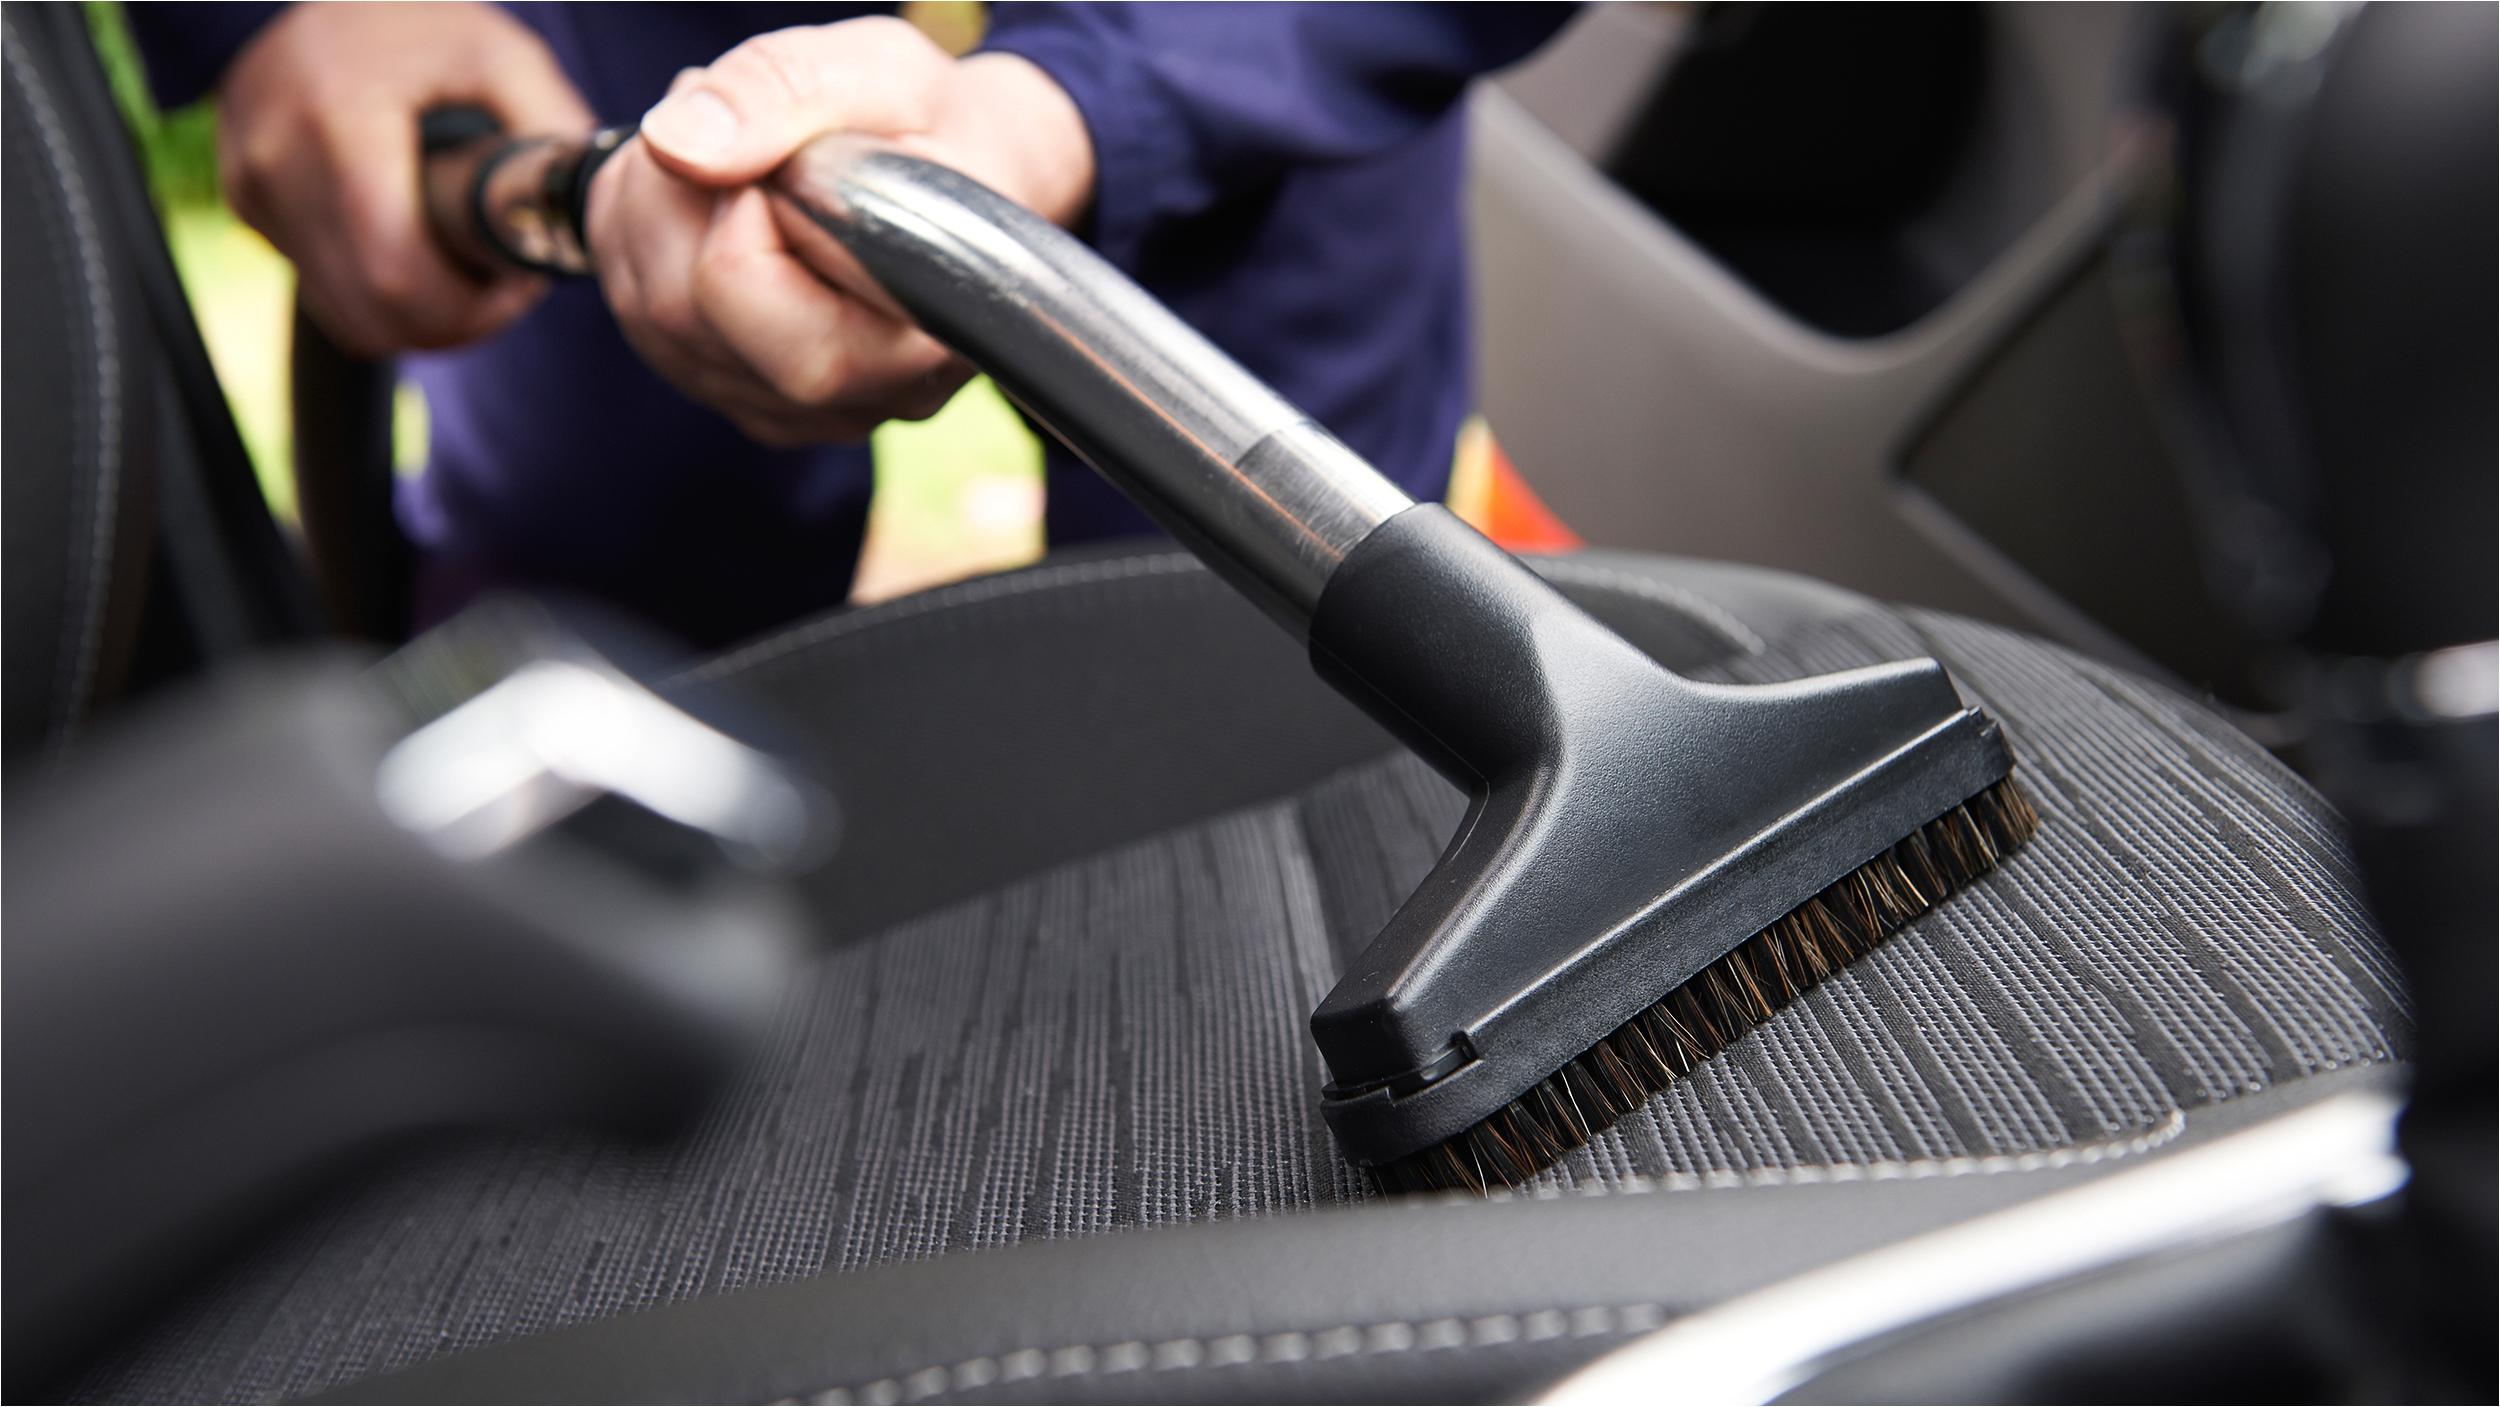 clean car vacuum today 170814 tease f7eaee7d164196b0f45af06da1846944 jpg